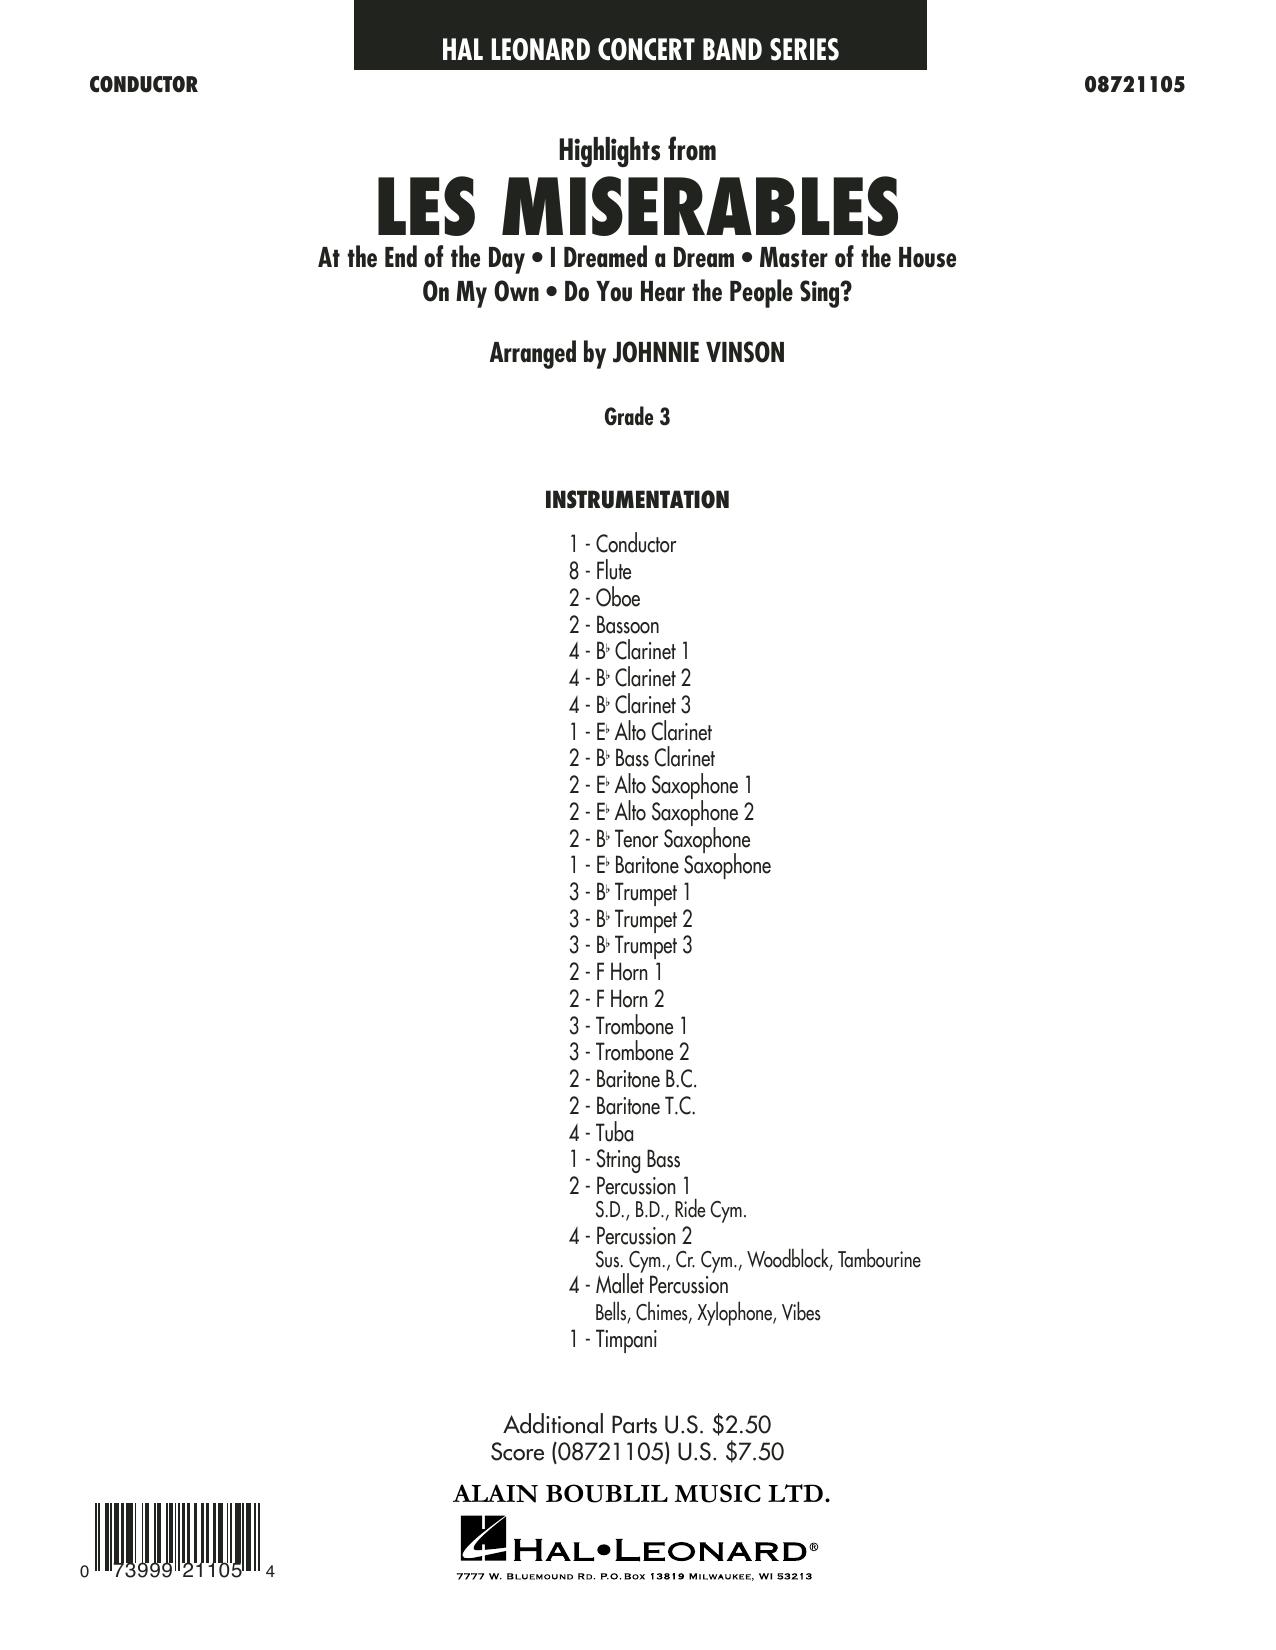 Highlights from Les Misérables (arr. Johnnie Vinson) - Conductor (Concert Band)